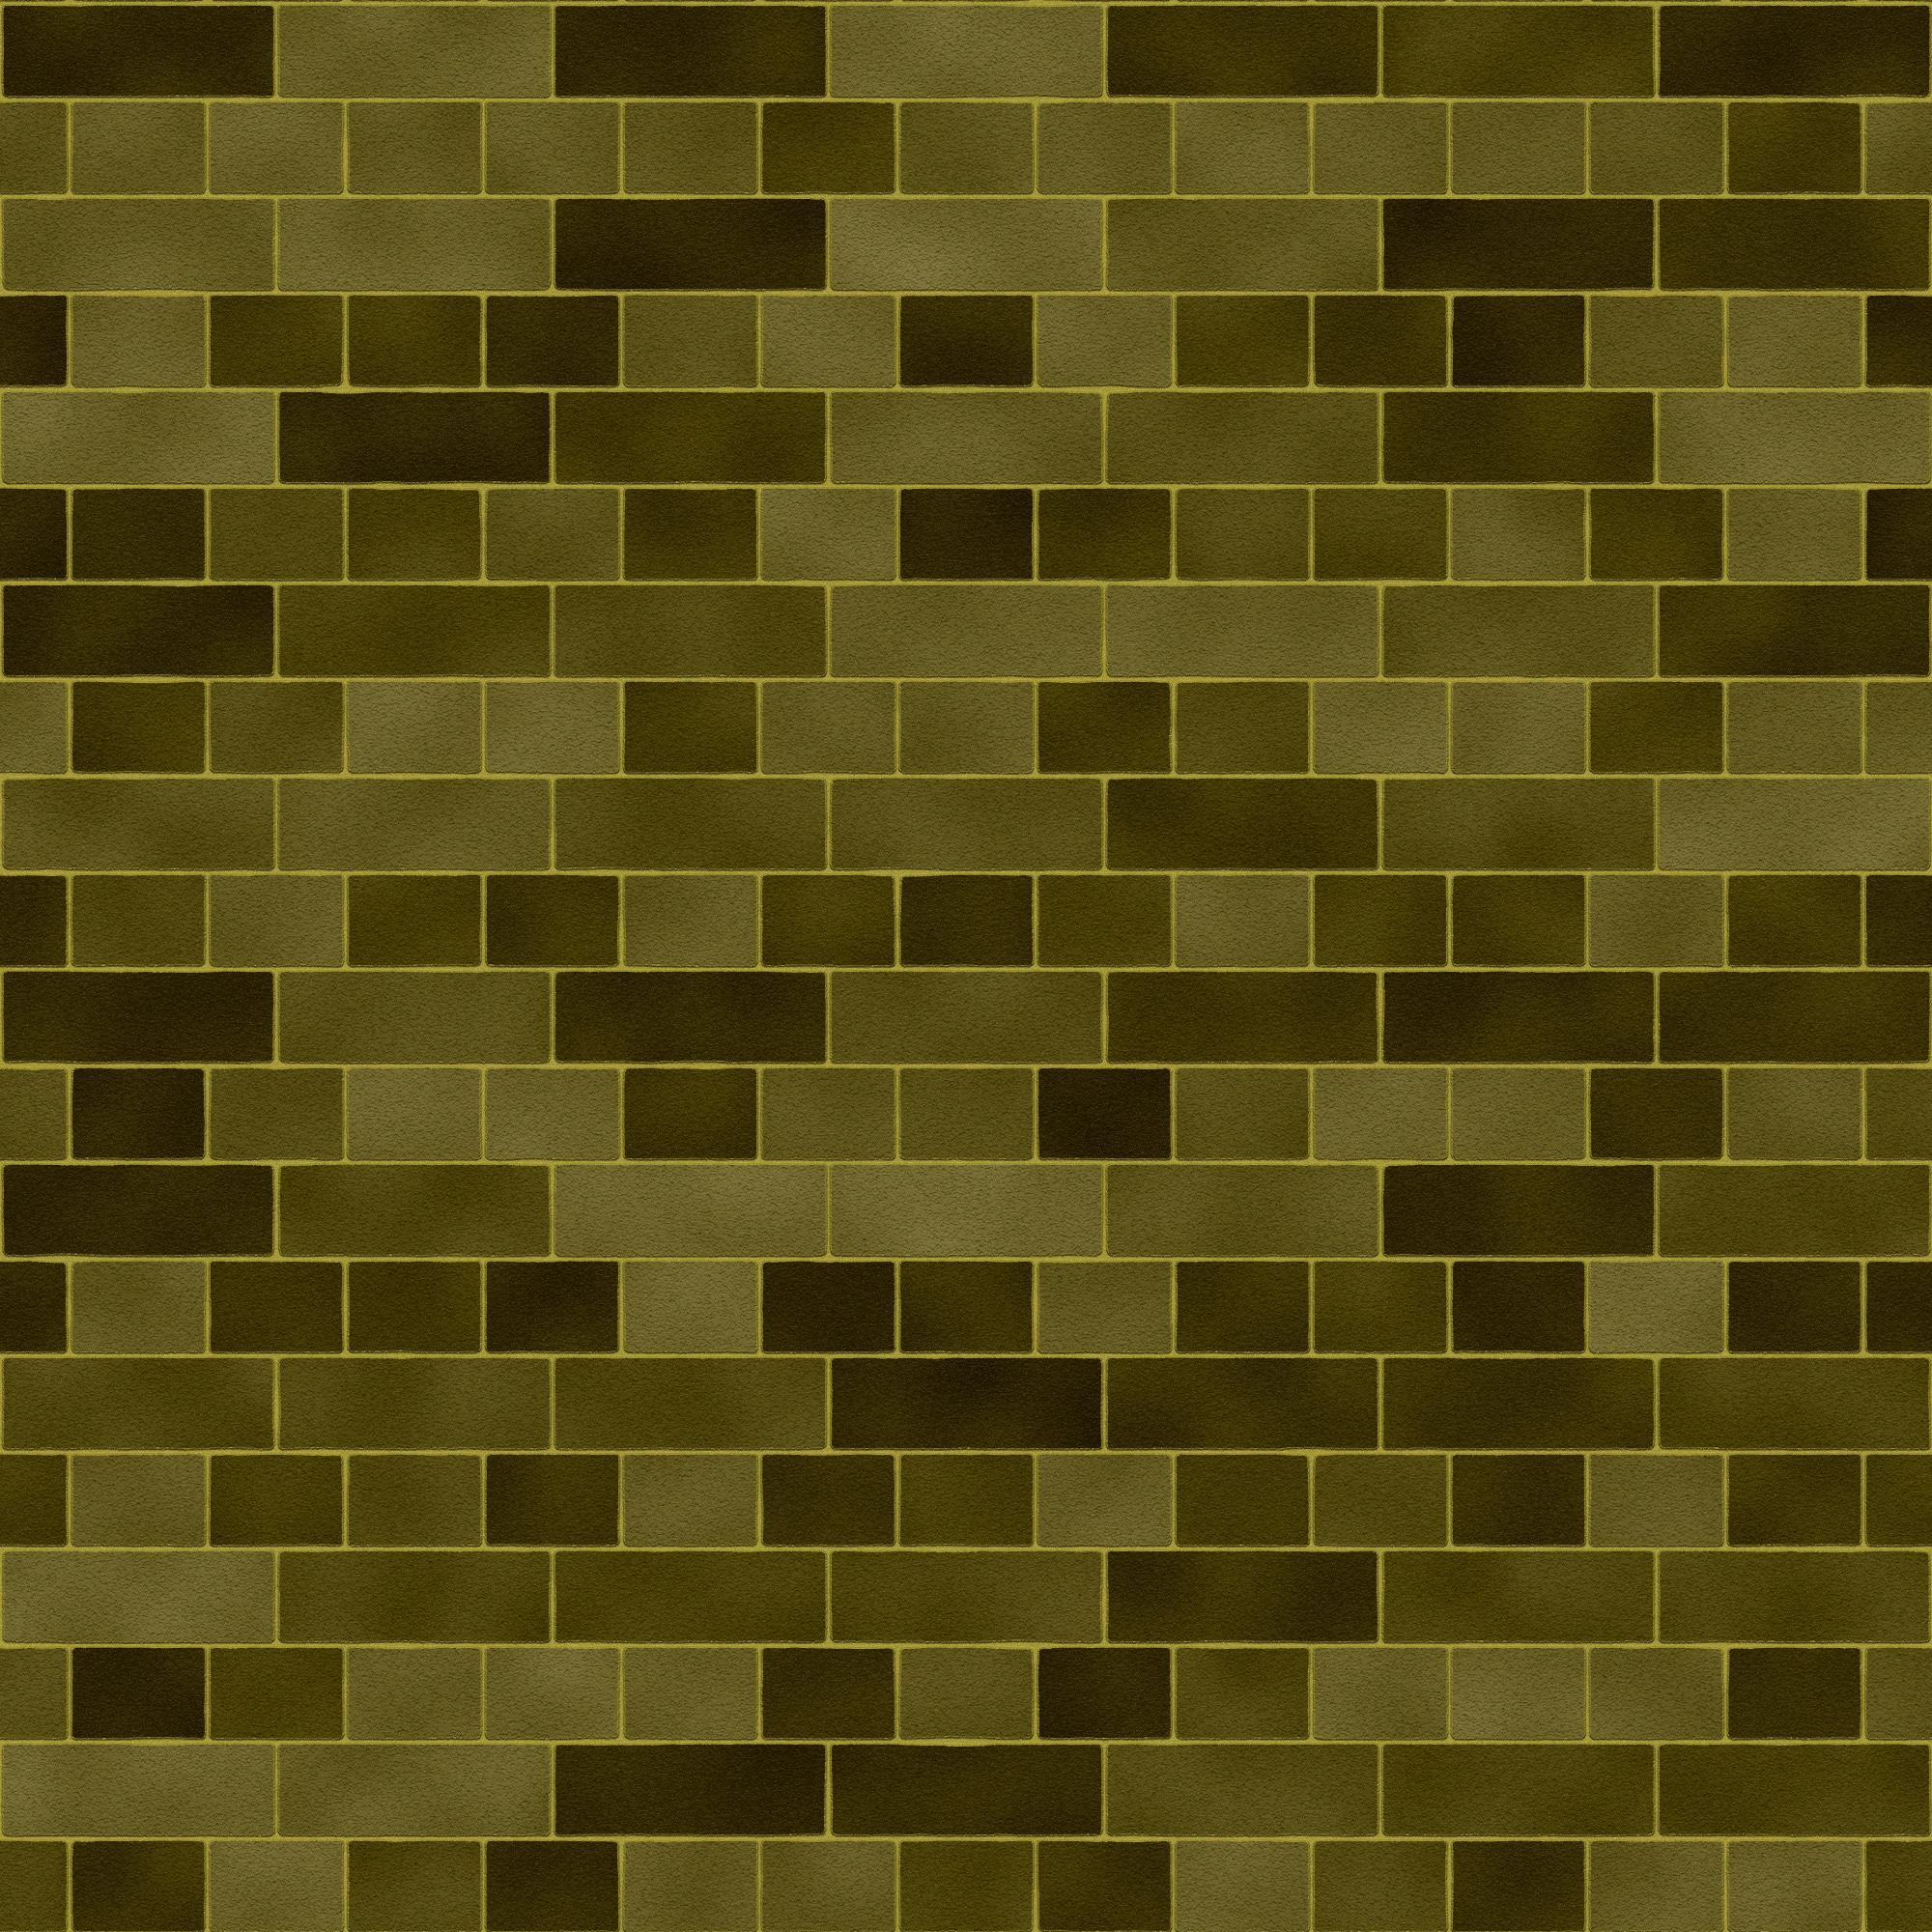 green brick wall texture, green brick wall, download photo, background, texture